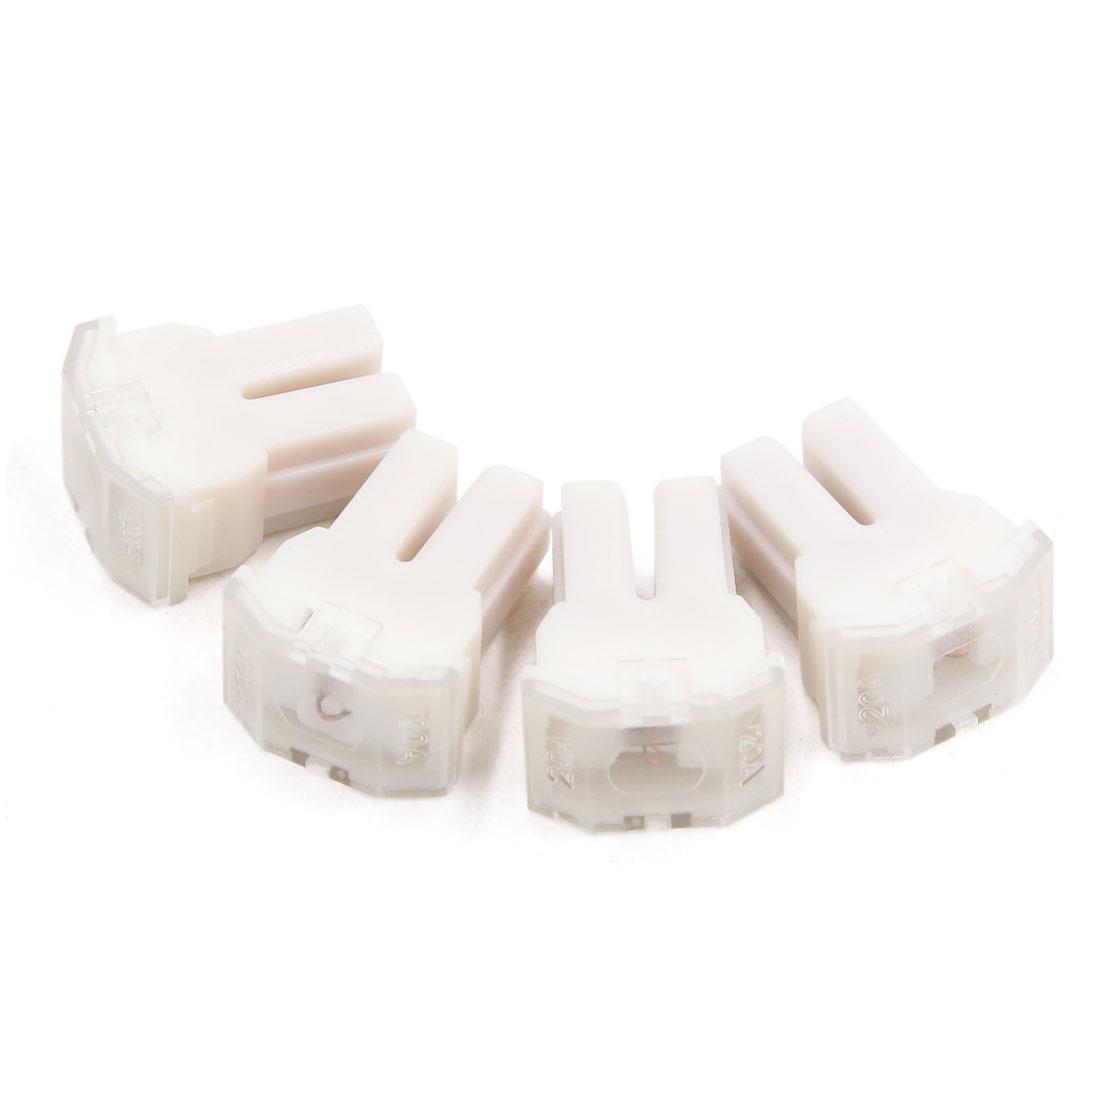 4pcs 20A White Plastic Casing Female PAL Cartridge Fuse for Auto Car Vehicle